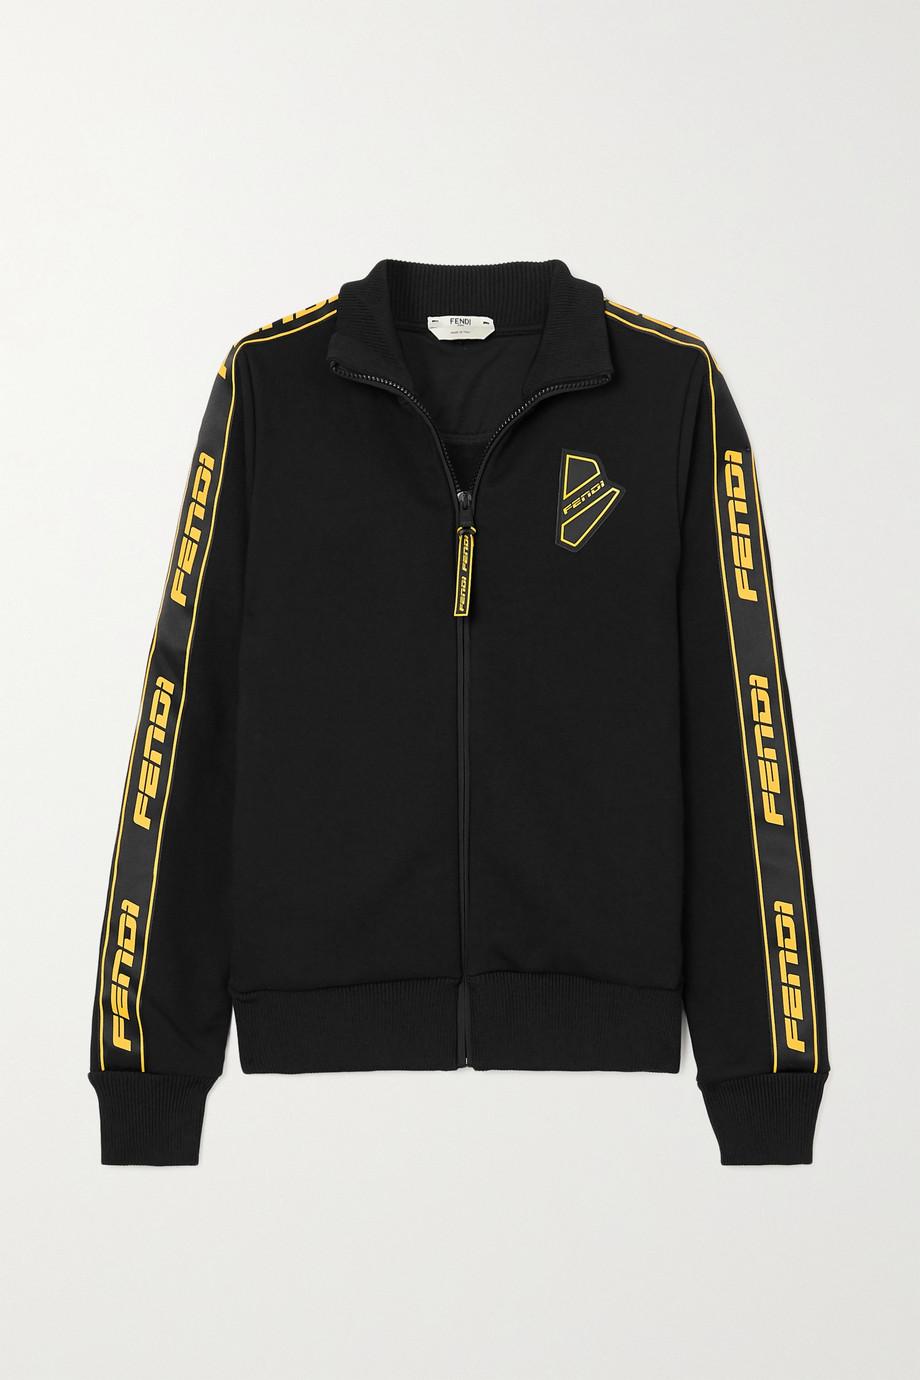 Fendi Appliquéd tech cotton-jersey track jacket